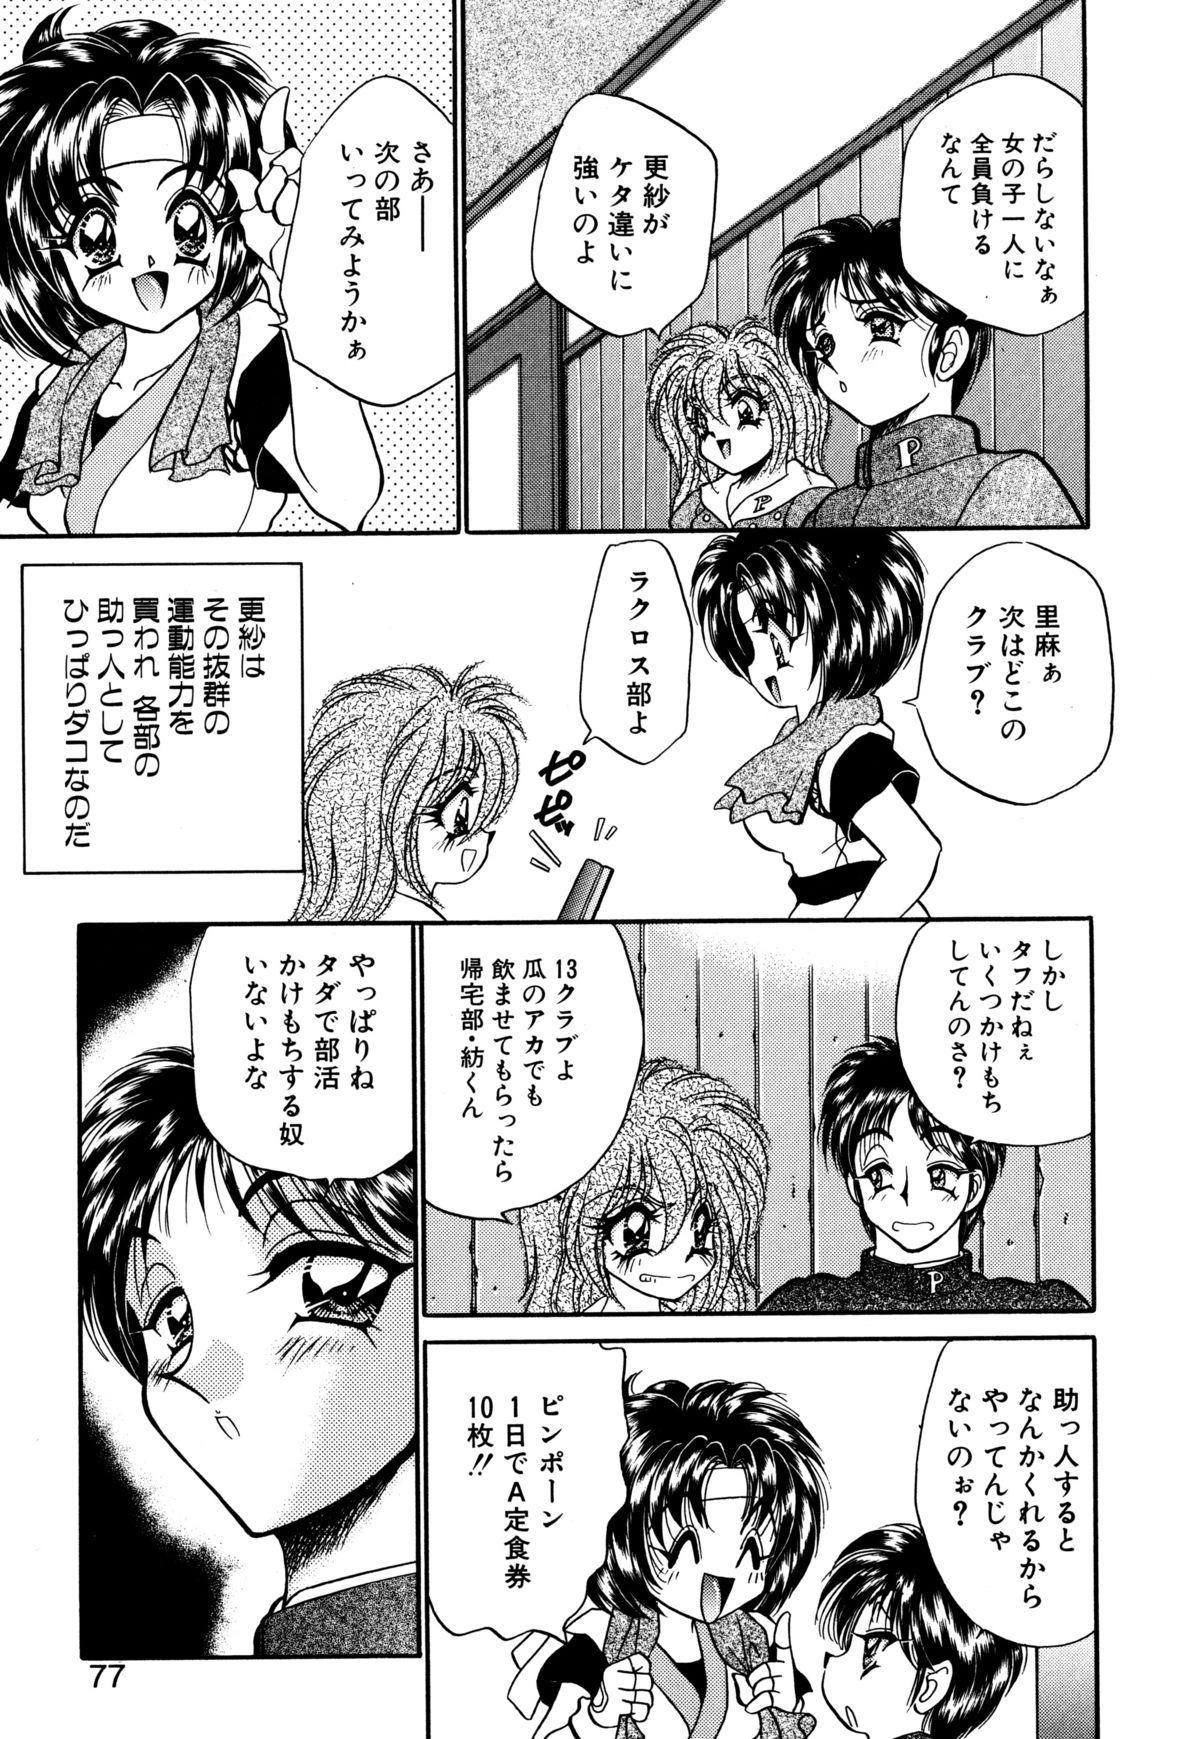 Kigurumi Sentai Quiltian 75